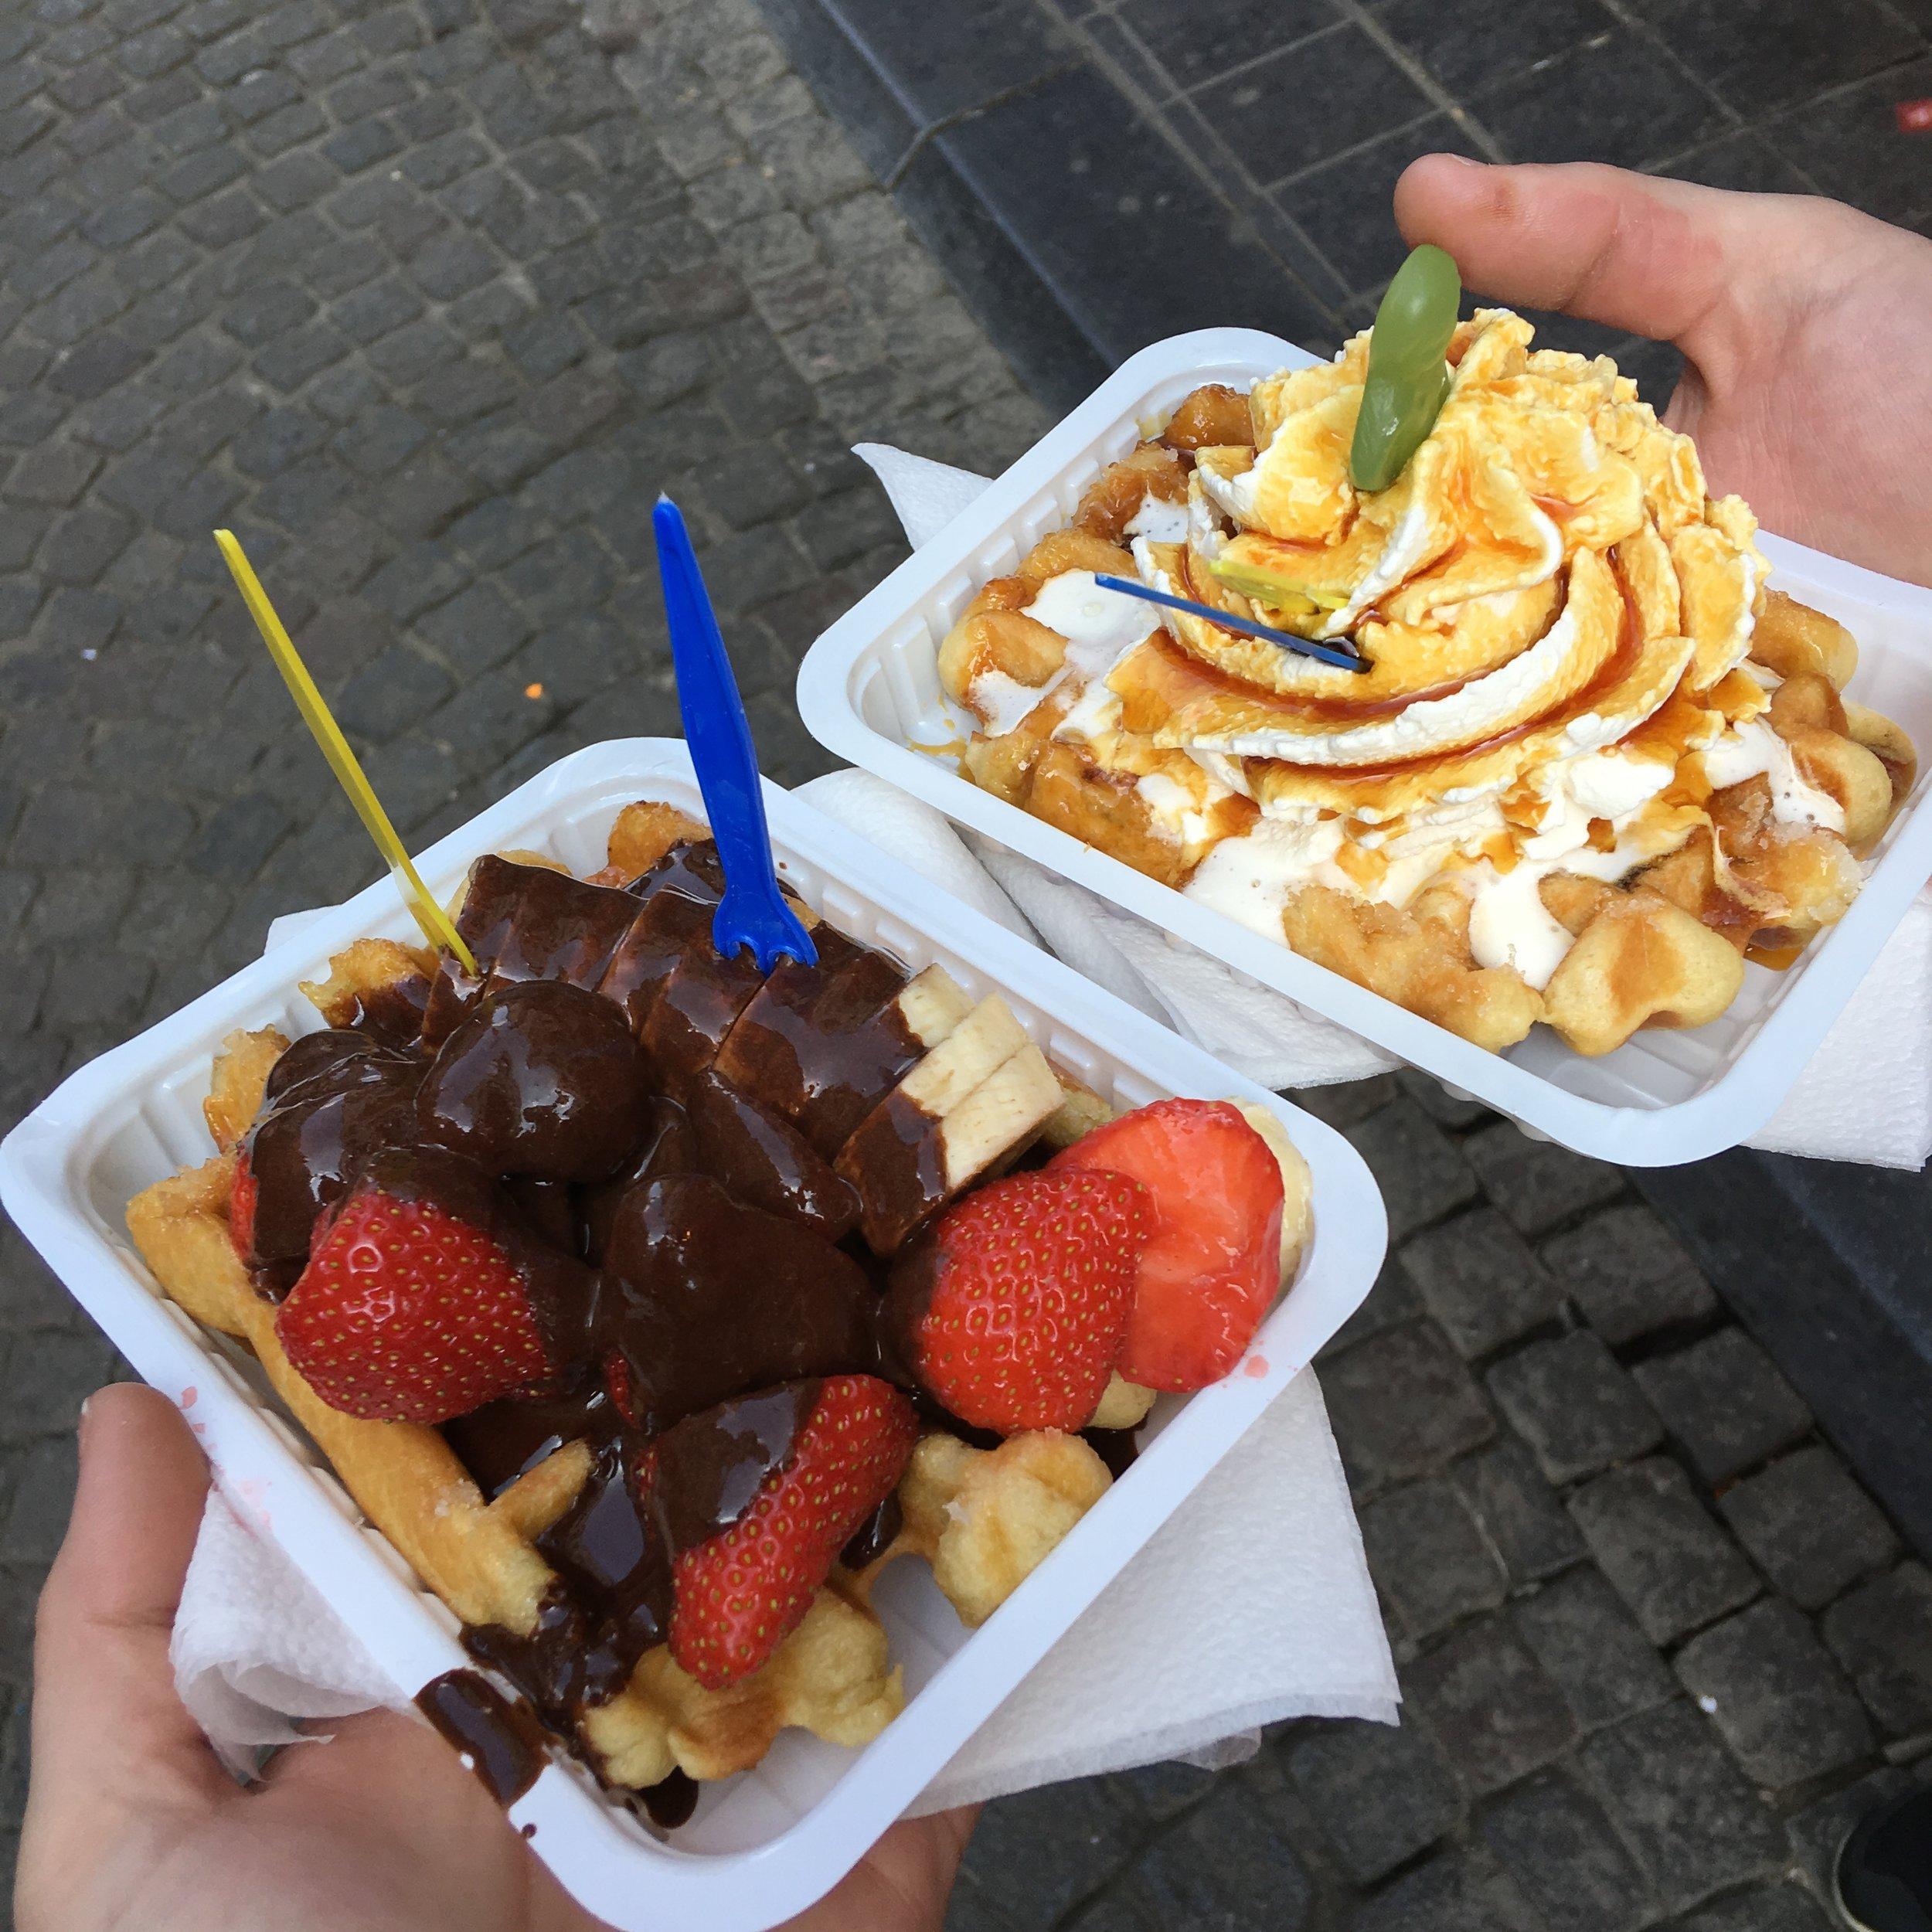 My everyday dream breakfast in one photo